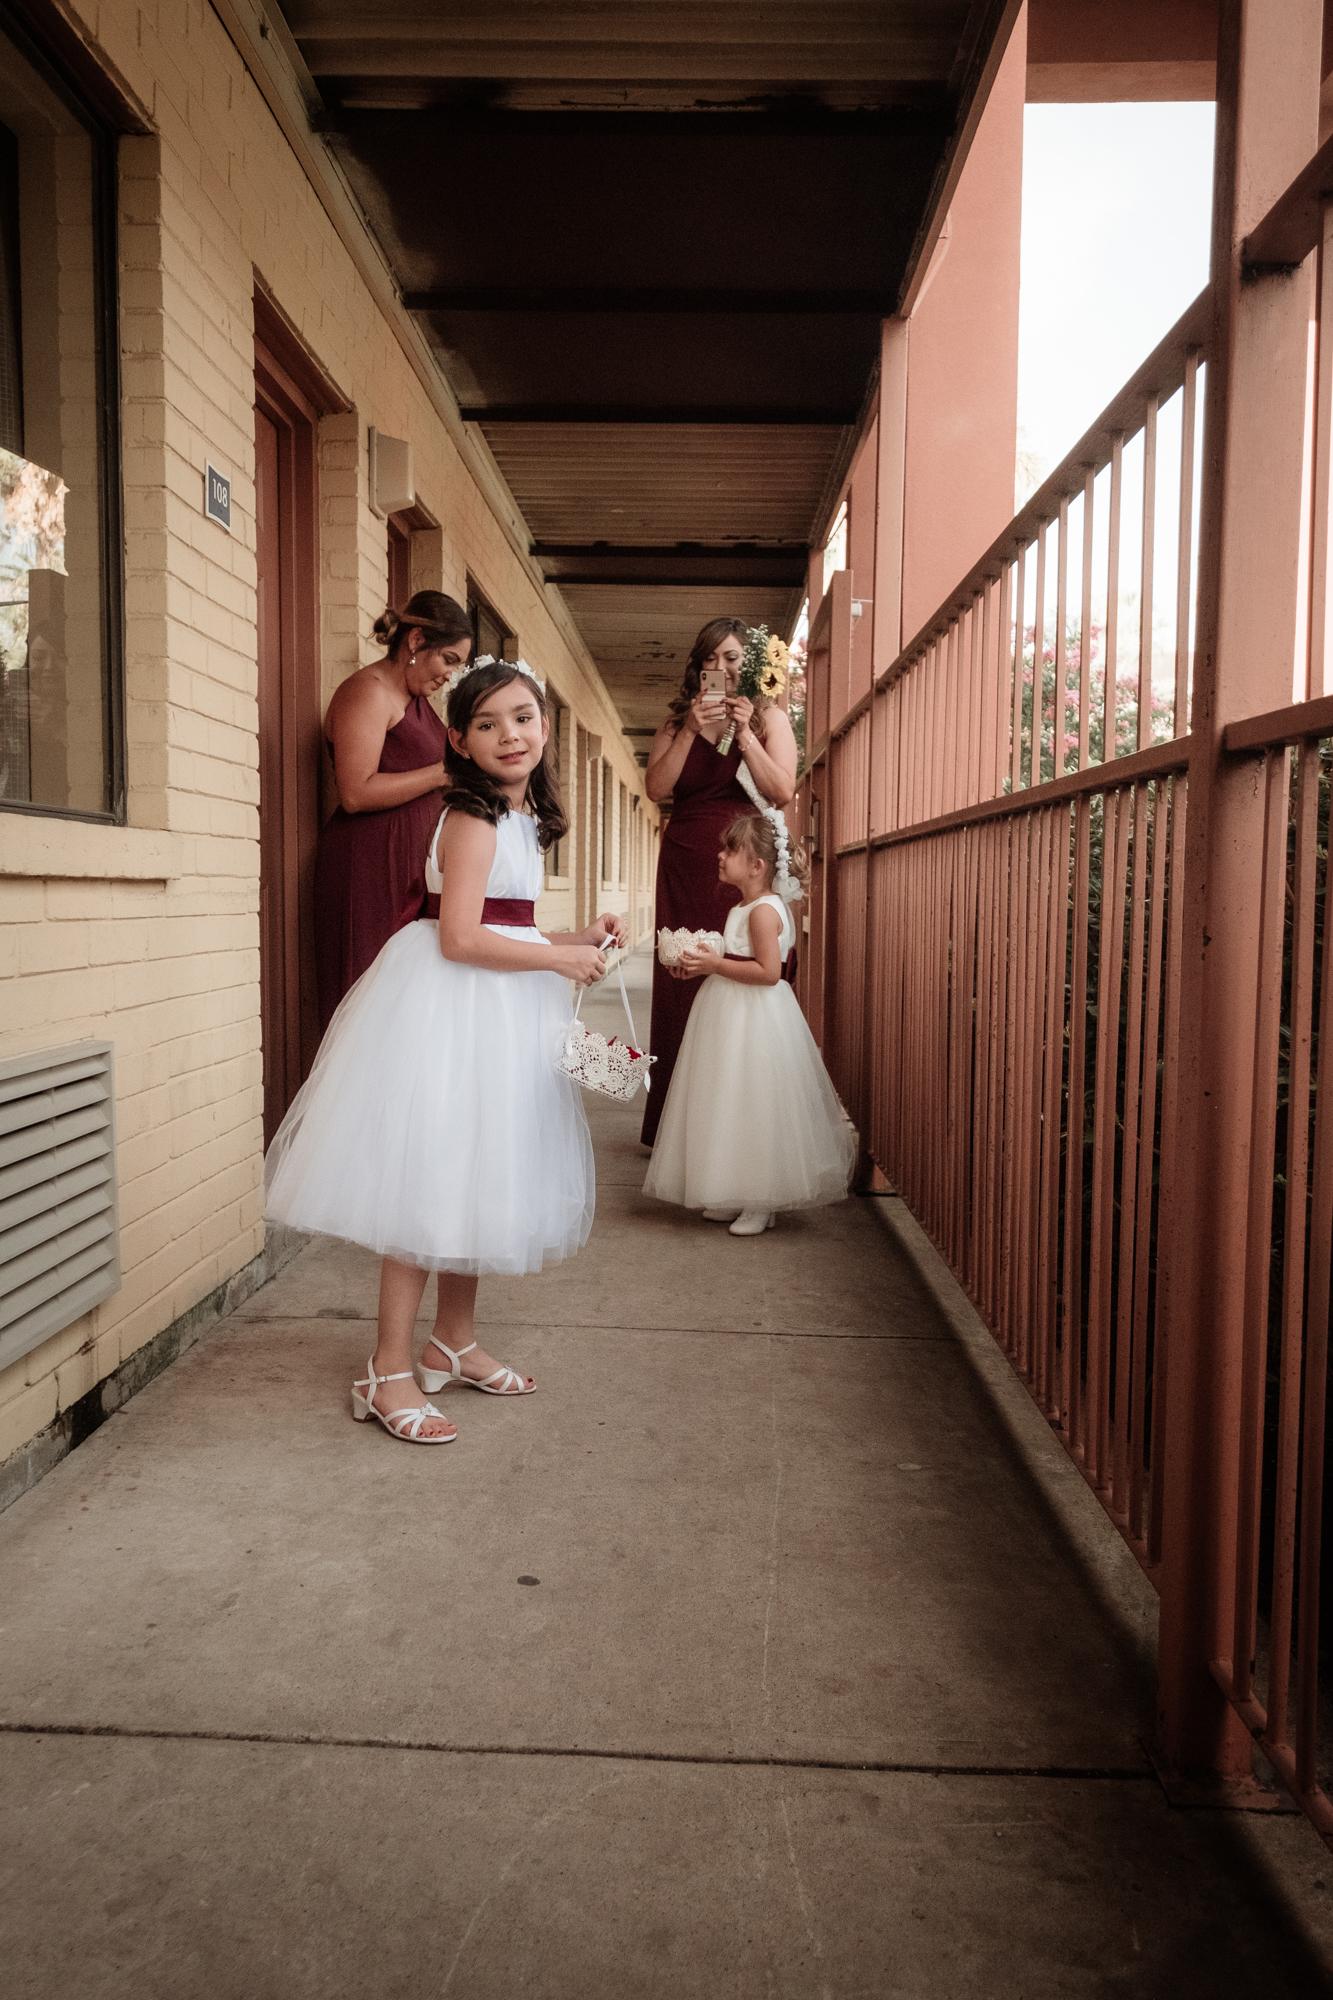 DallasAlyssa-Wedding-2019-JF-0679.jpg